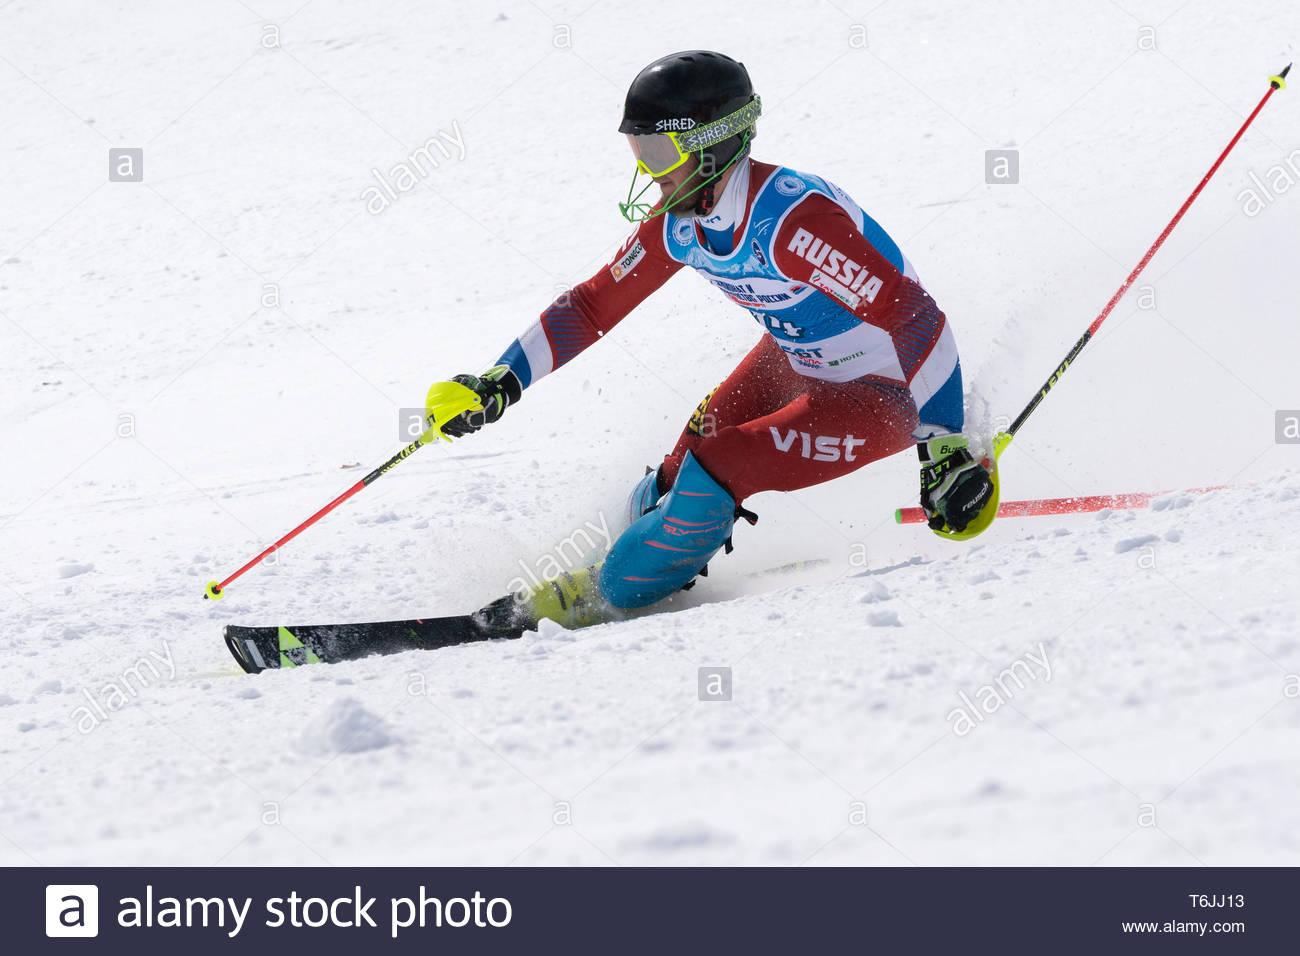 MOROZNAYA MOUNTAIN, KAMCHATKA, RUSSIA - MAR 29, 2019: International Ski Federation Championship, Russian Alpine Skiing Championship slalom. Mount skie Stock Photo